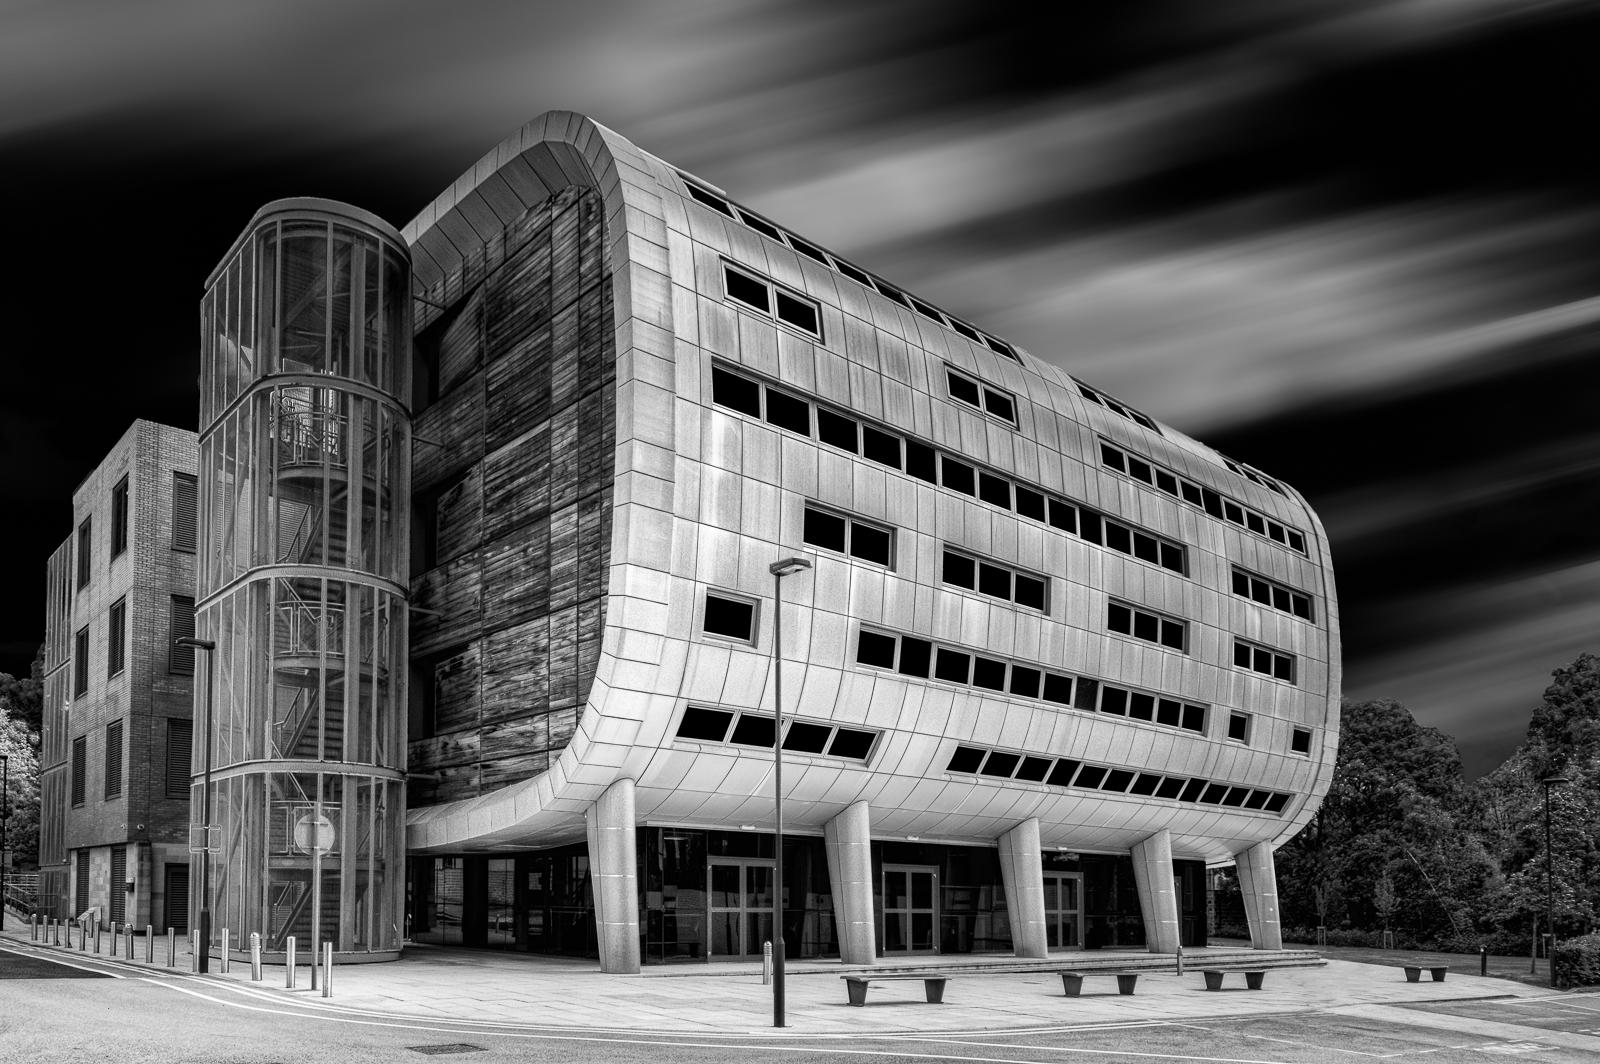 <h5>The Charles Thackrah Building Leeds University</h5><p>By Mark Seton</p>